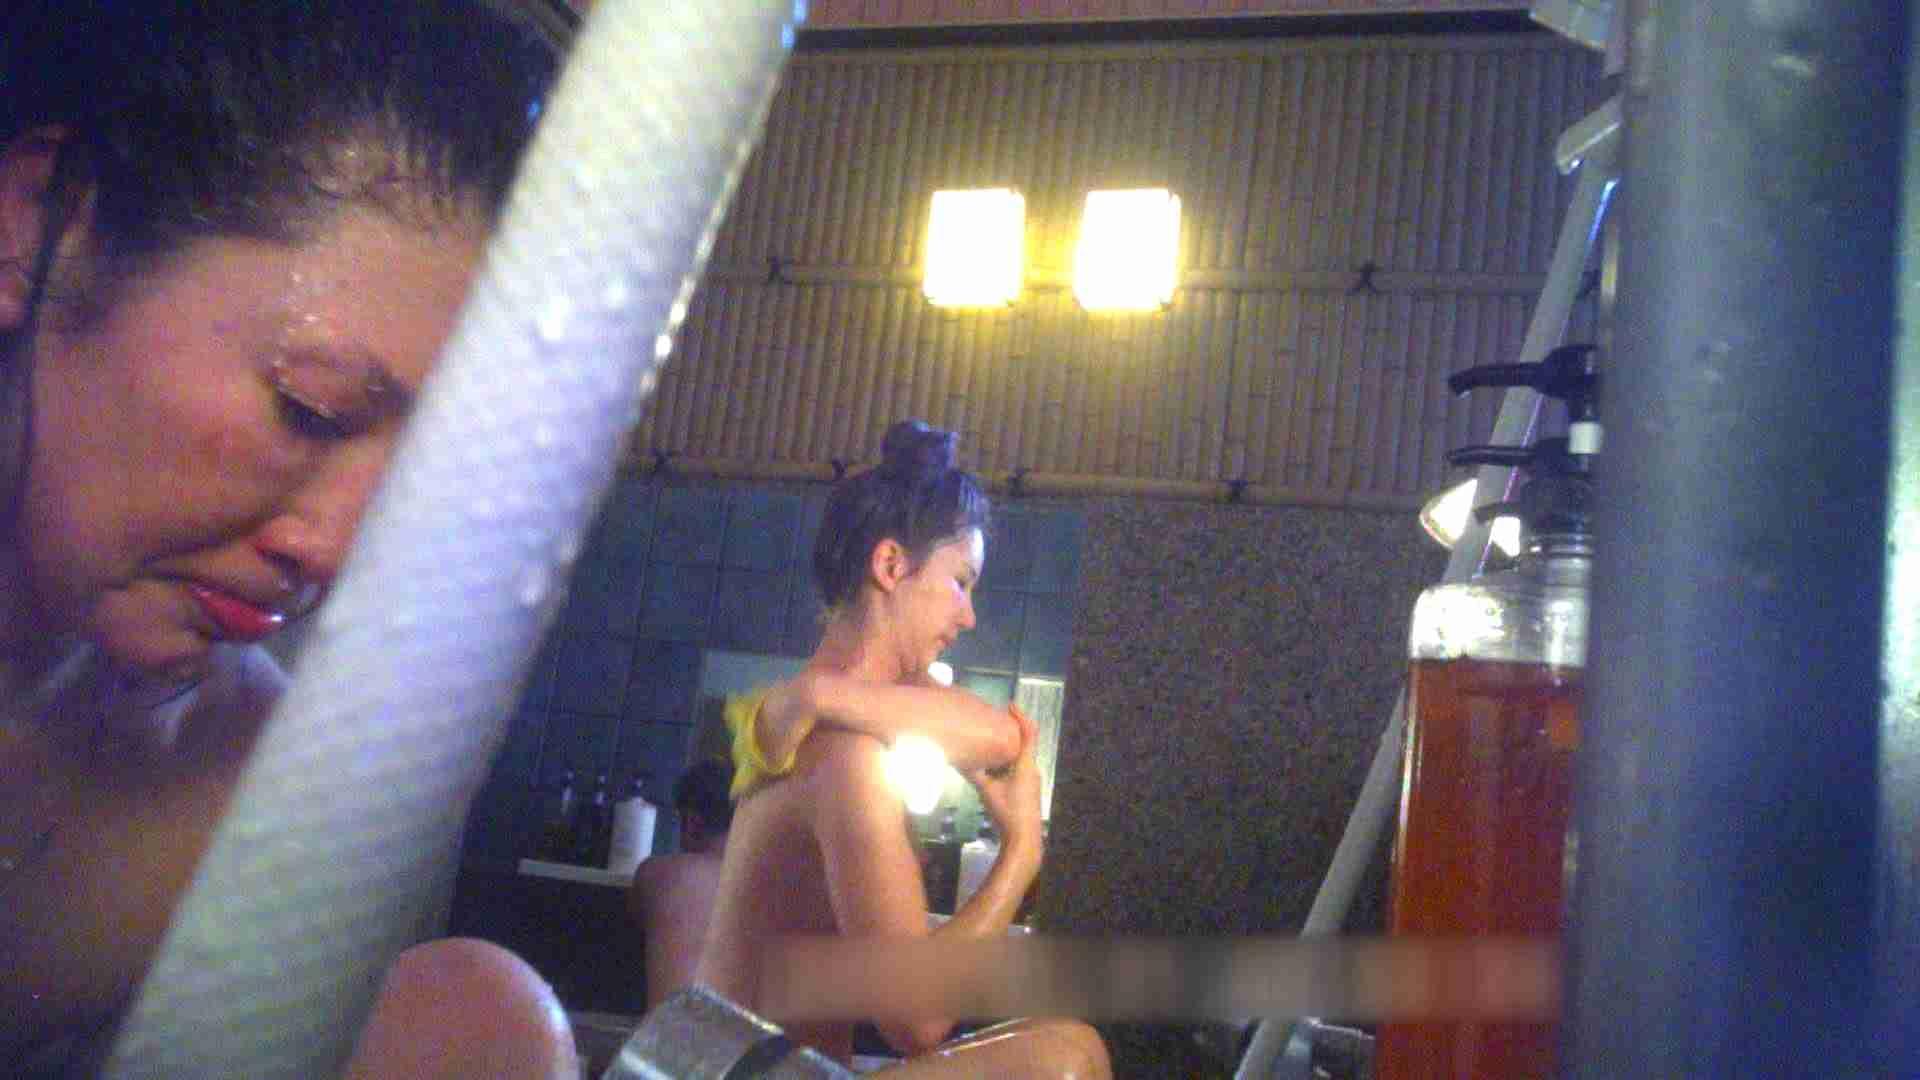 TG.15 【上等兵】高級旅館の爆乳女将で有名っぽい 爆乳  64pic 54